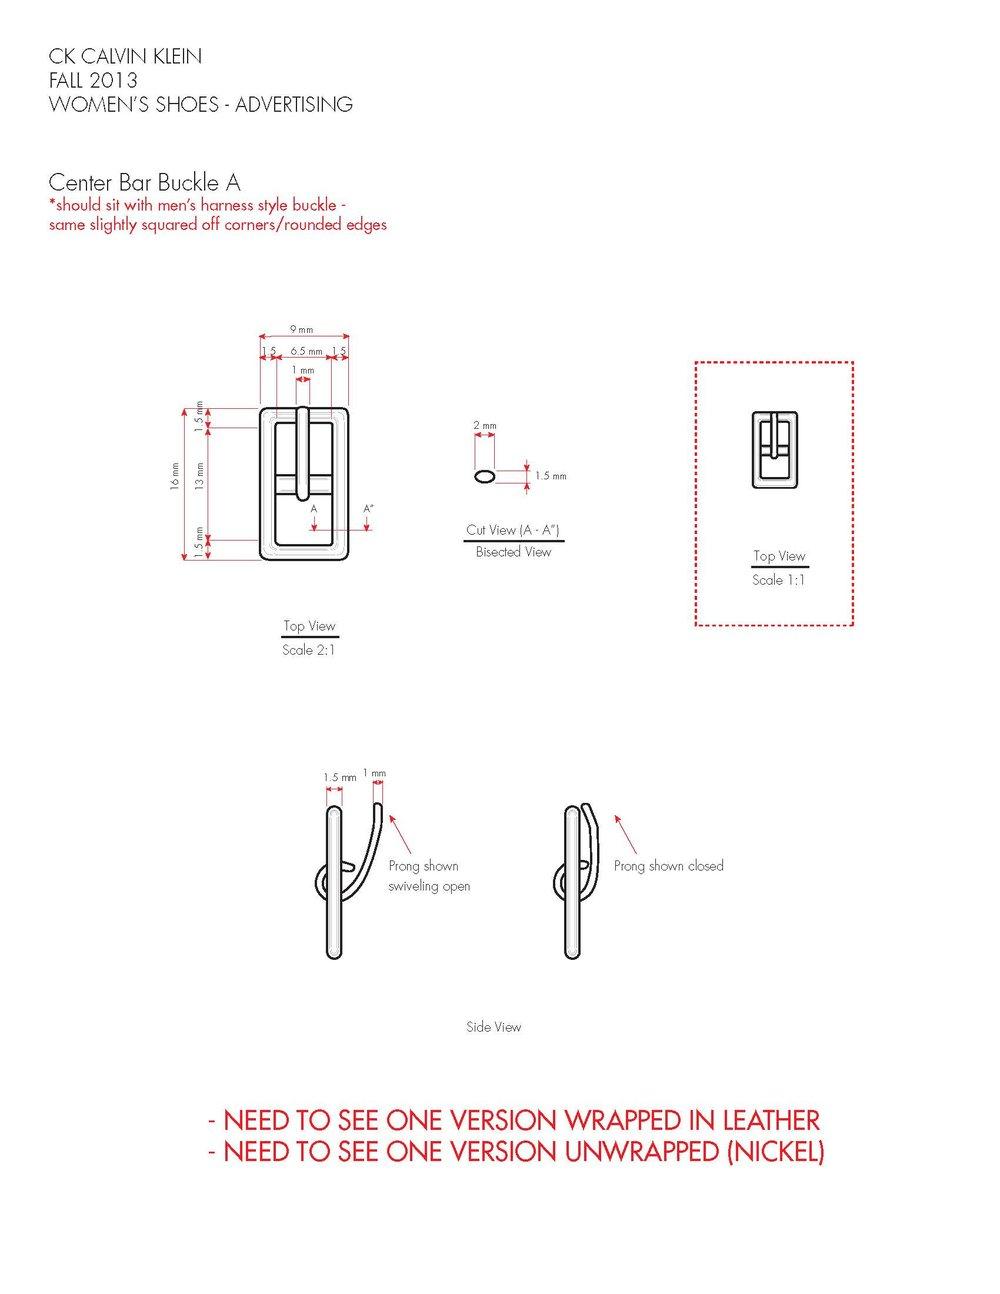 KGRESS Portfolio Work-CKPF13 Advertising Footwear_Page_12.jpg